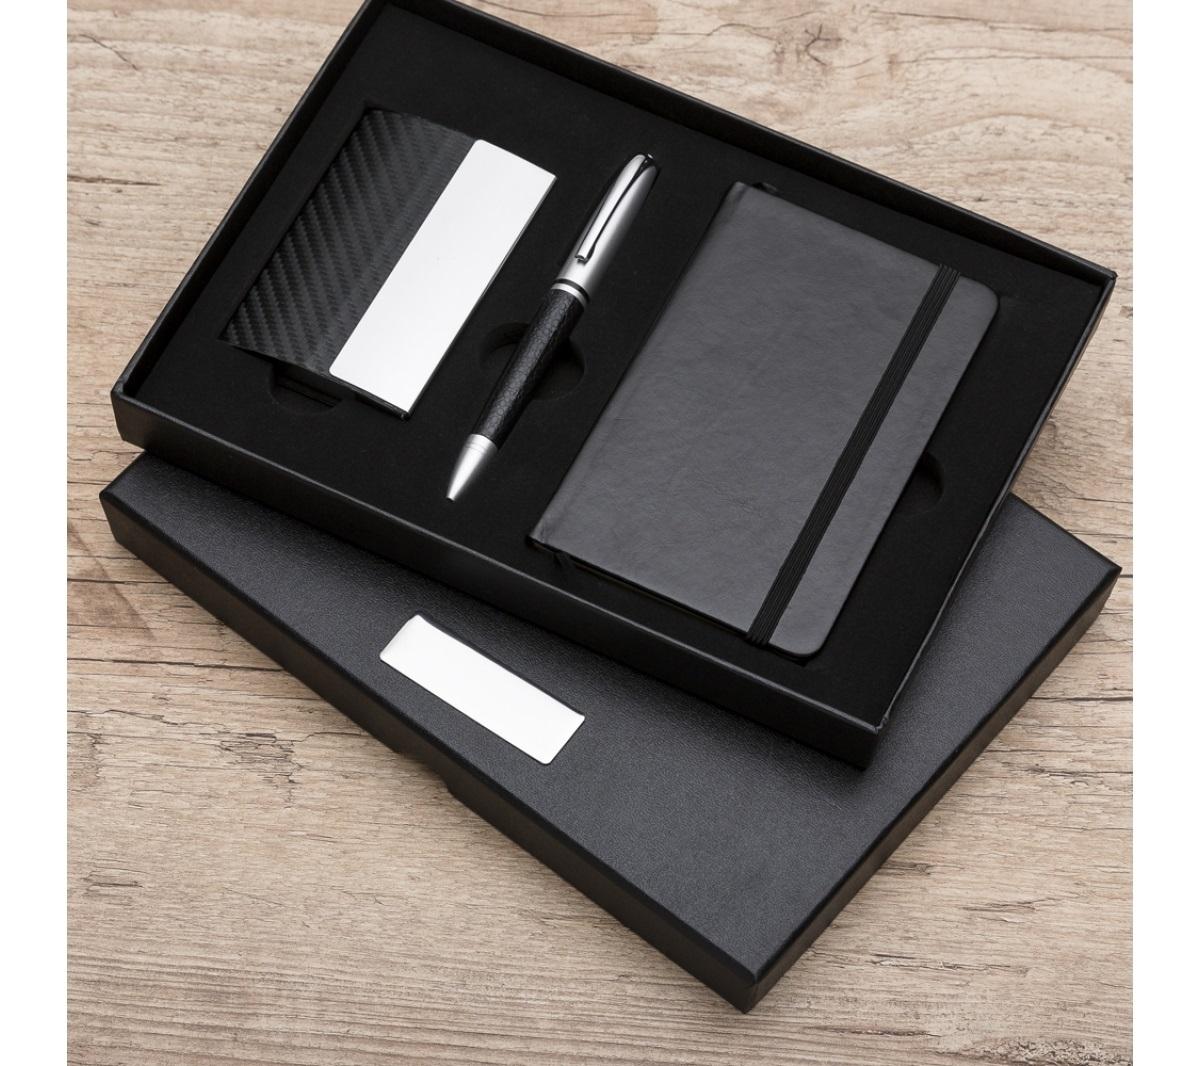 fa8fcd4d6 Brinde kit executivo personalizado 3 peças - Flic Brindes